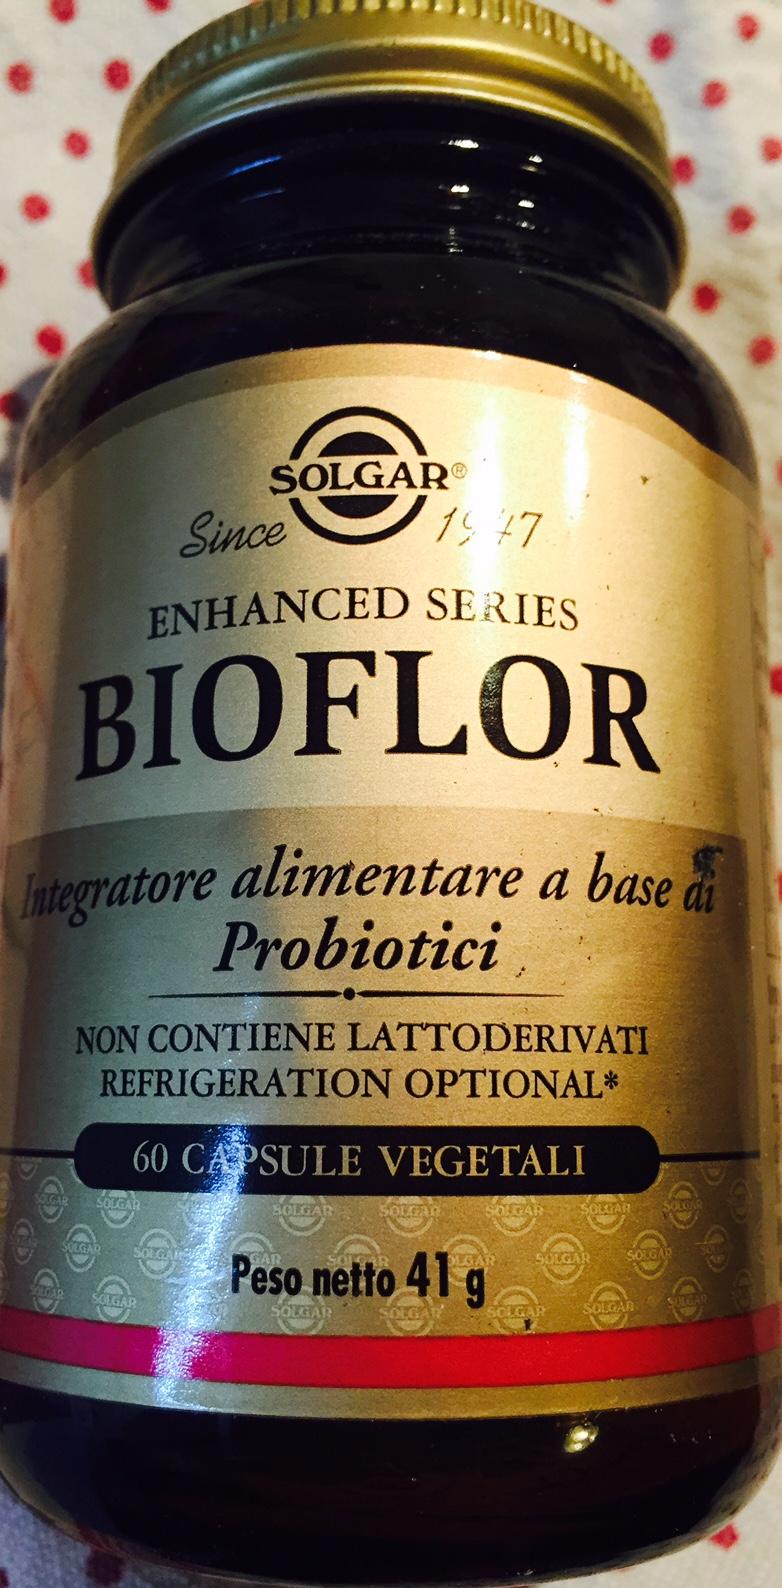 Bioflor Solgar - lattosio 0% Image